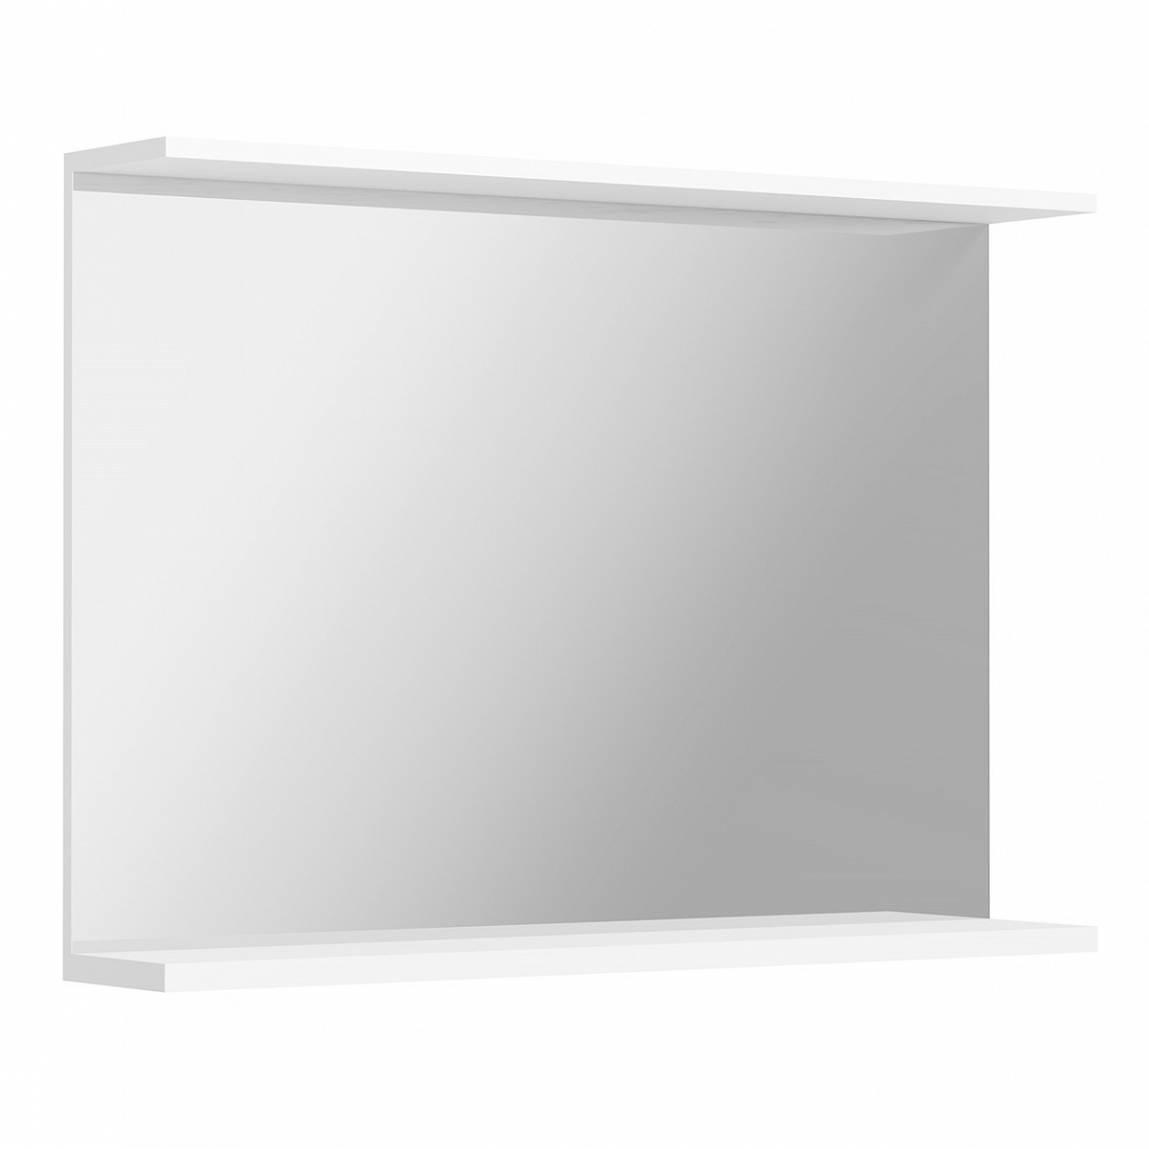 Image of Florence White 1050 Mirror